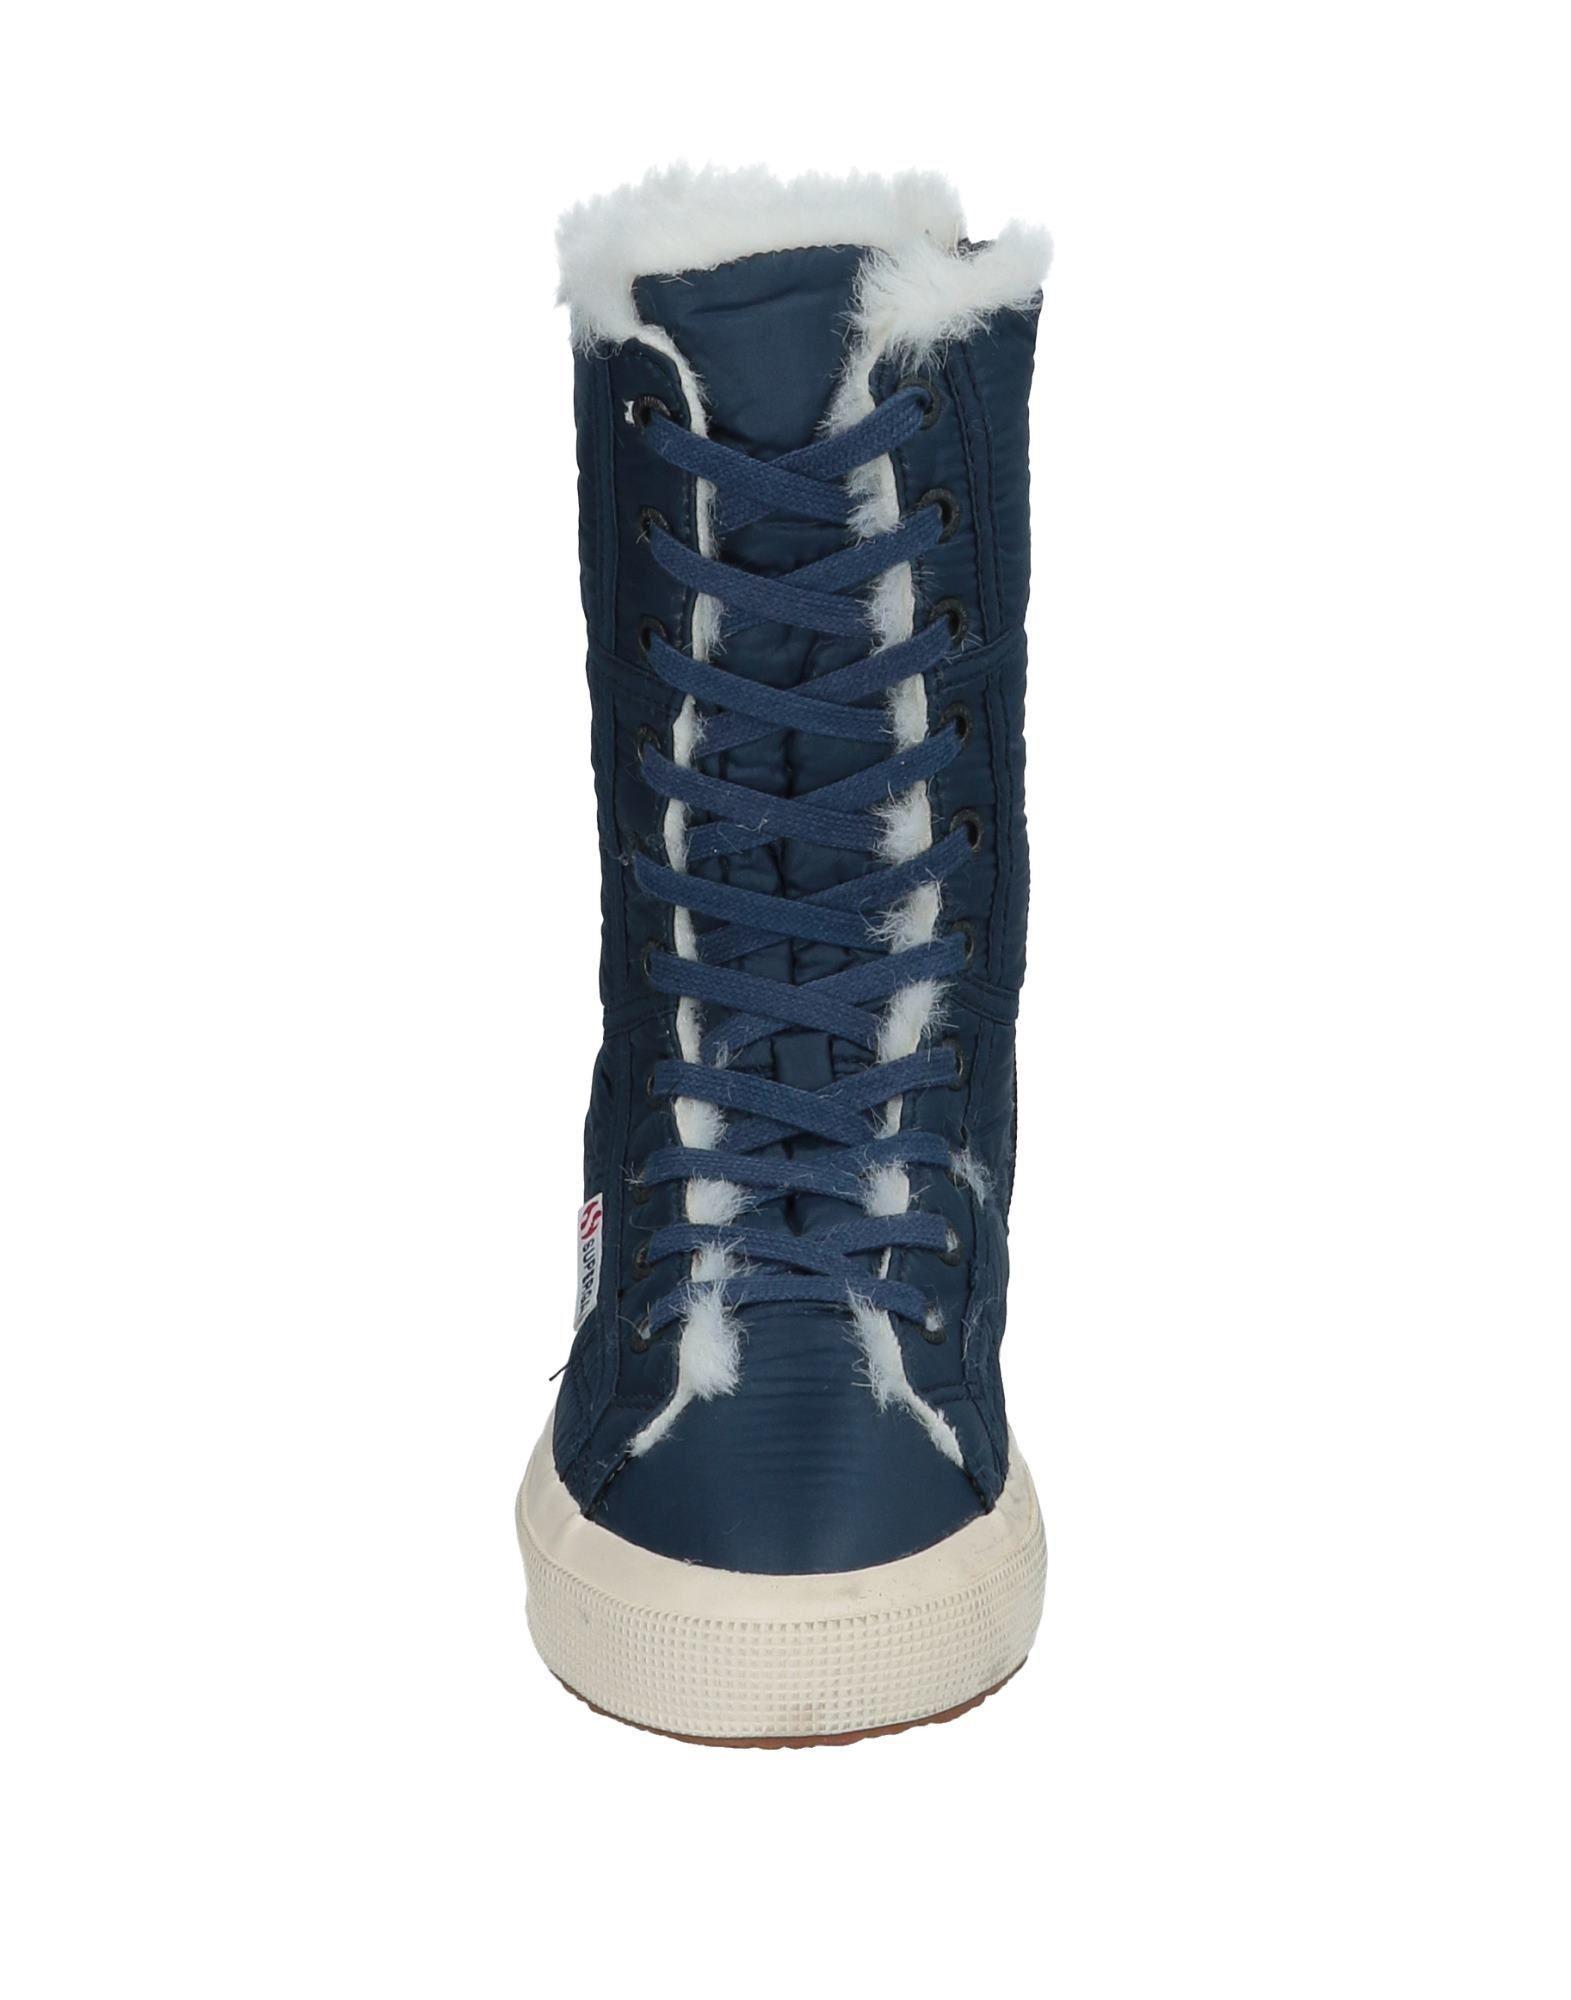 Superga High-tops & Sneakers in Dark Blue (Blue)